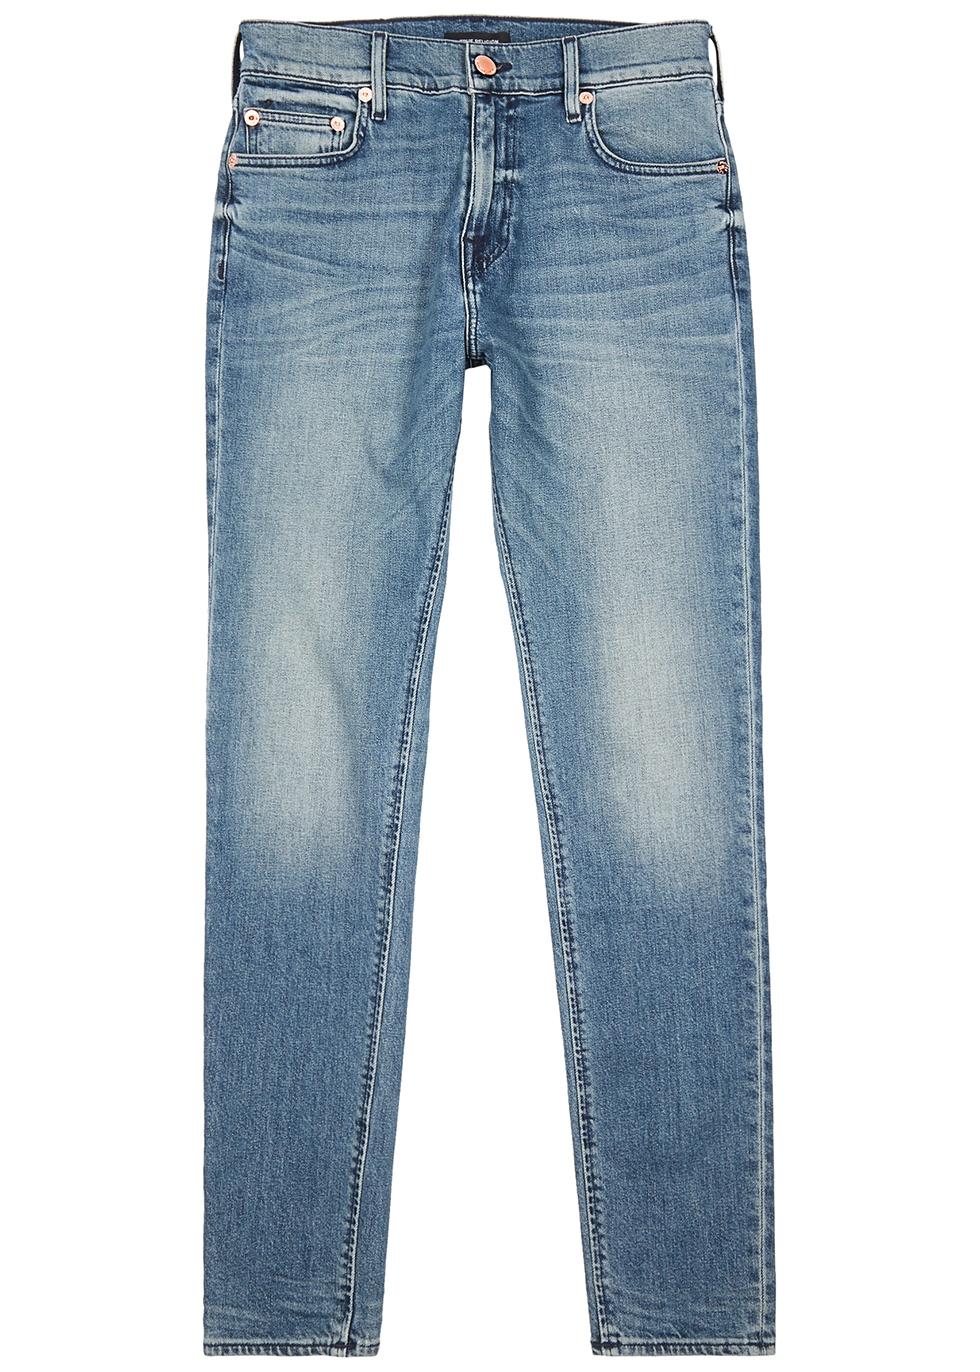 Jack light blue skinny jeans